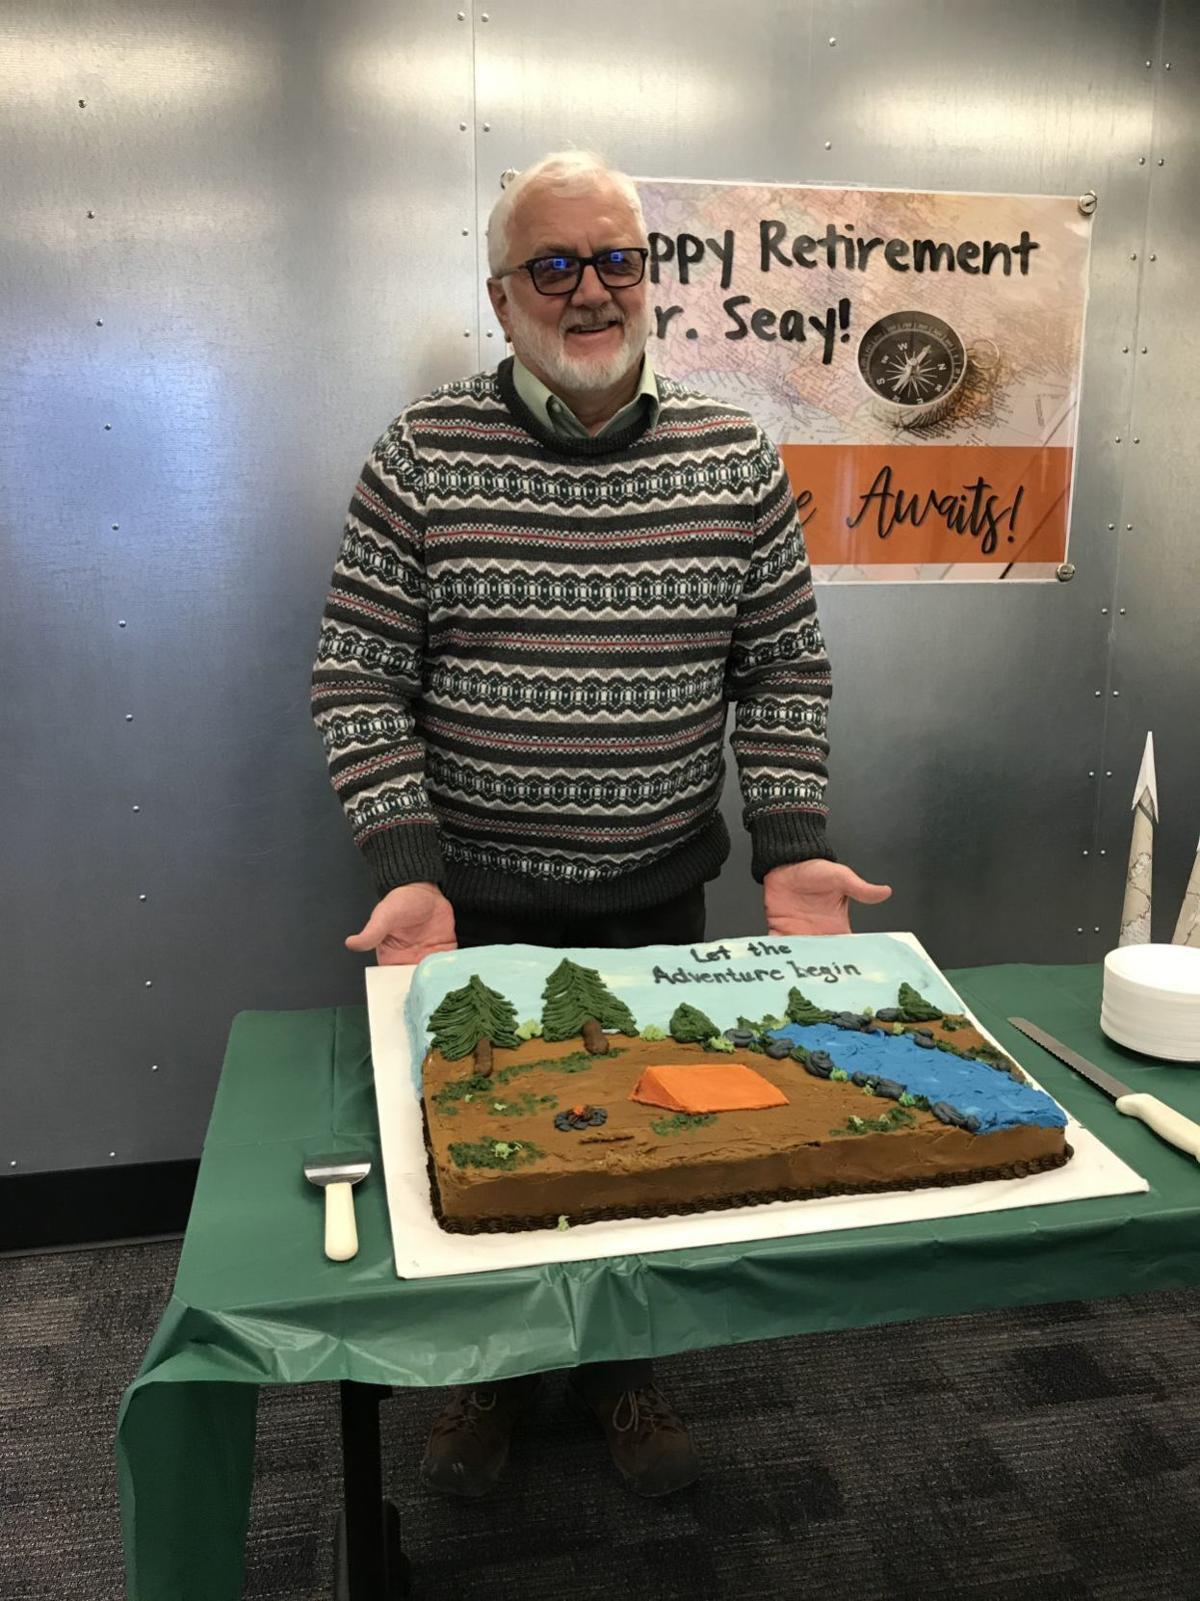 David Seay retires